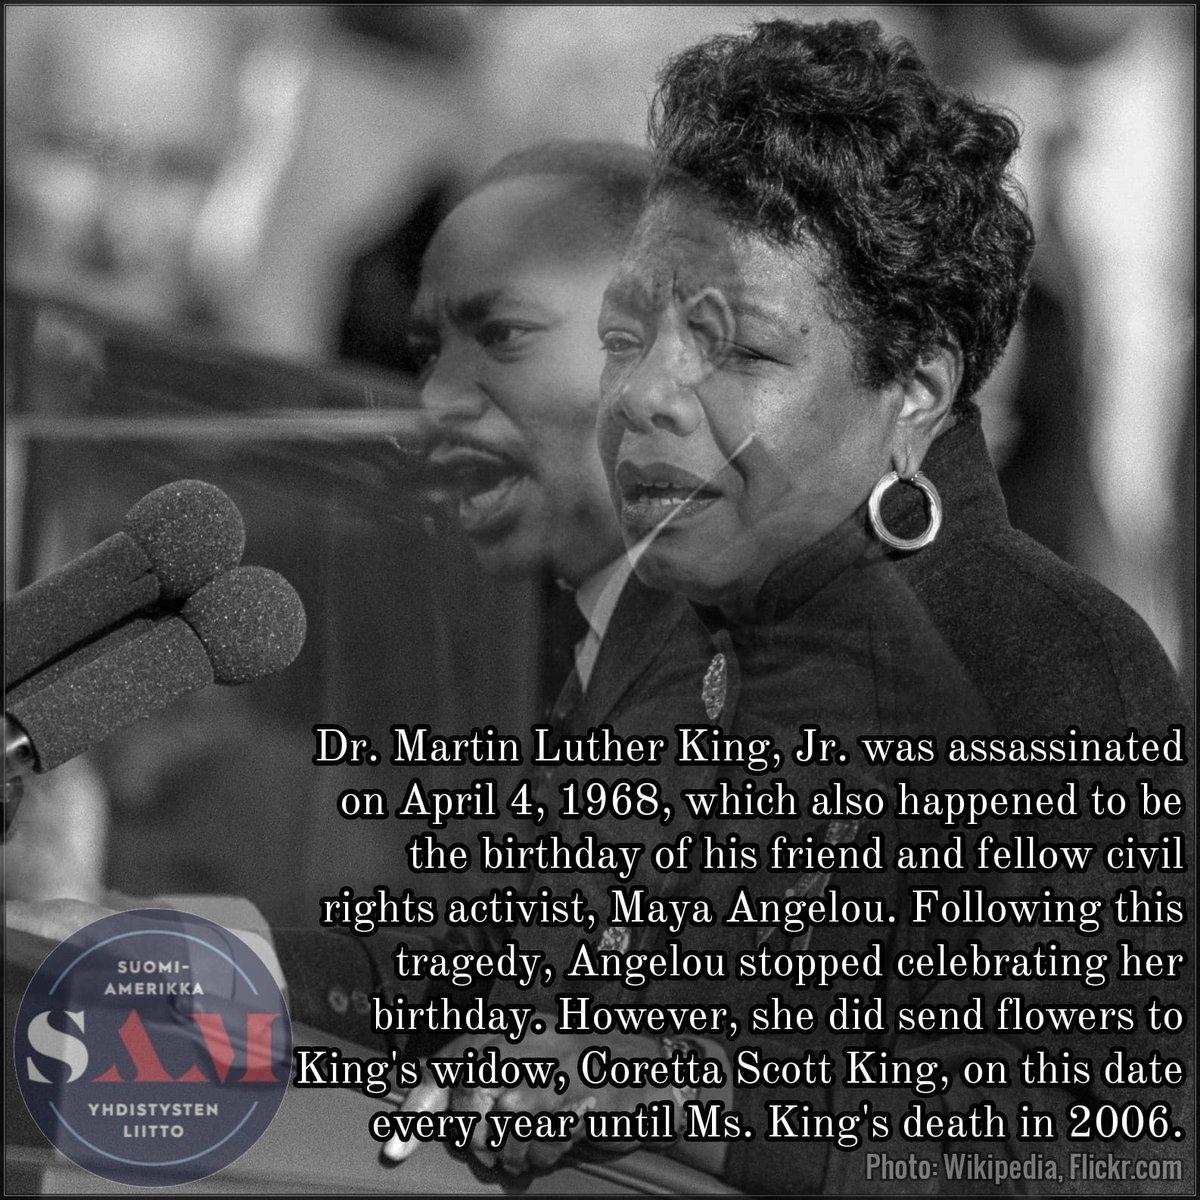 #MayaAngelou #MLK #DrMartinLutherKingJr #CorettaScottKing #CivilRights #BlackHistoryMonth #blackhistoryfacts #sampori #samsuomi